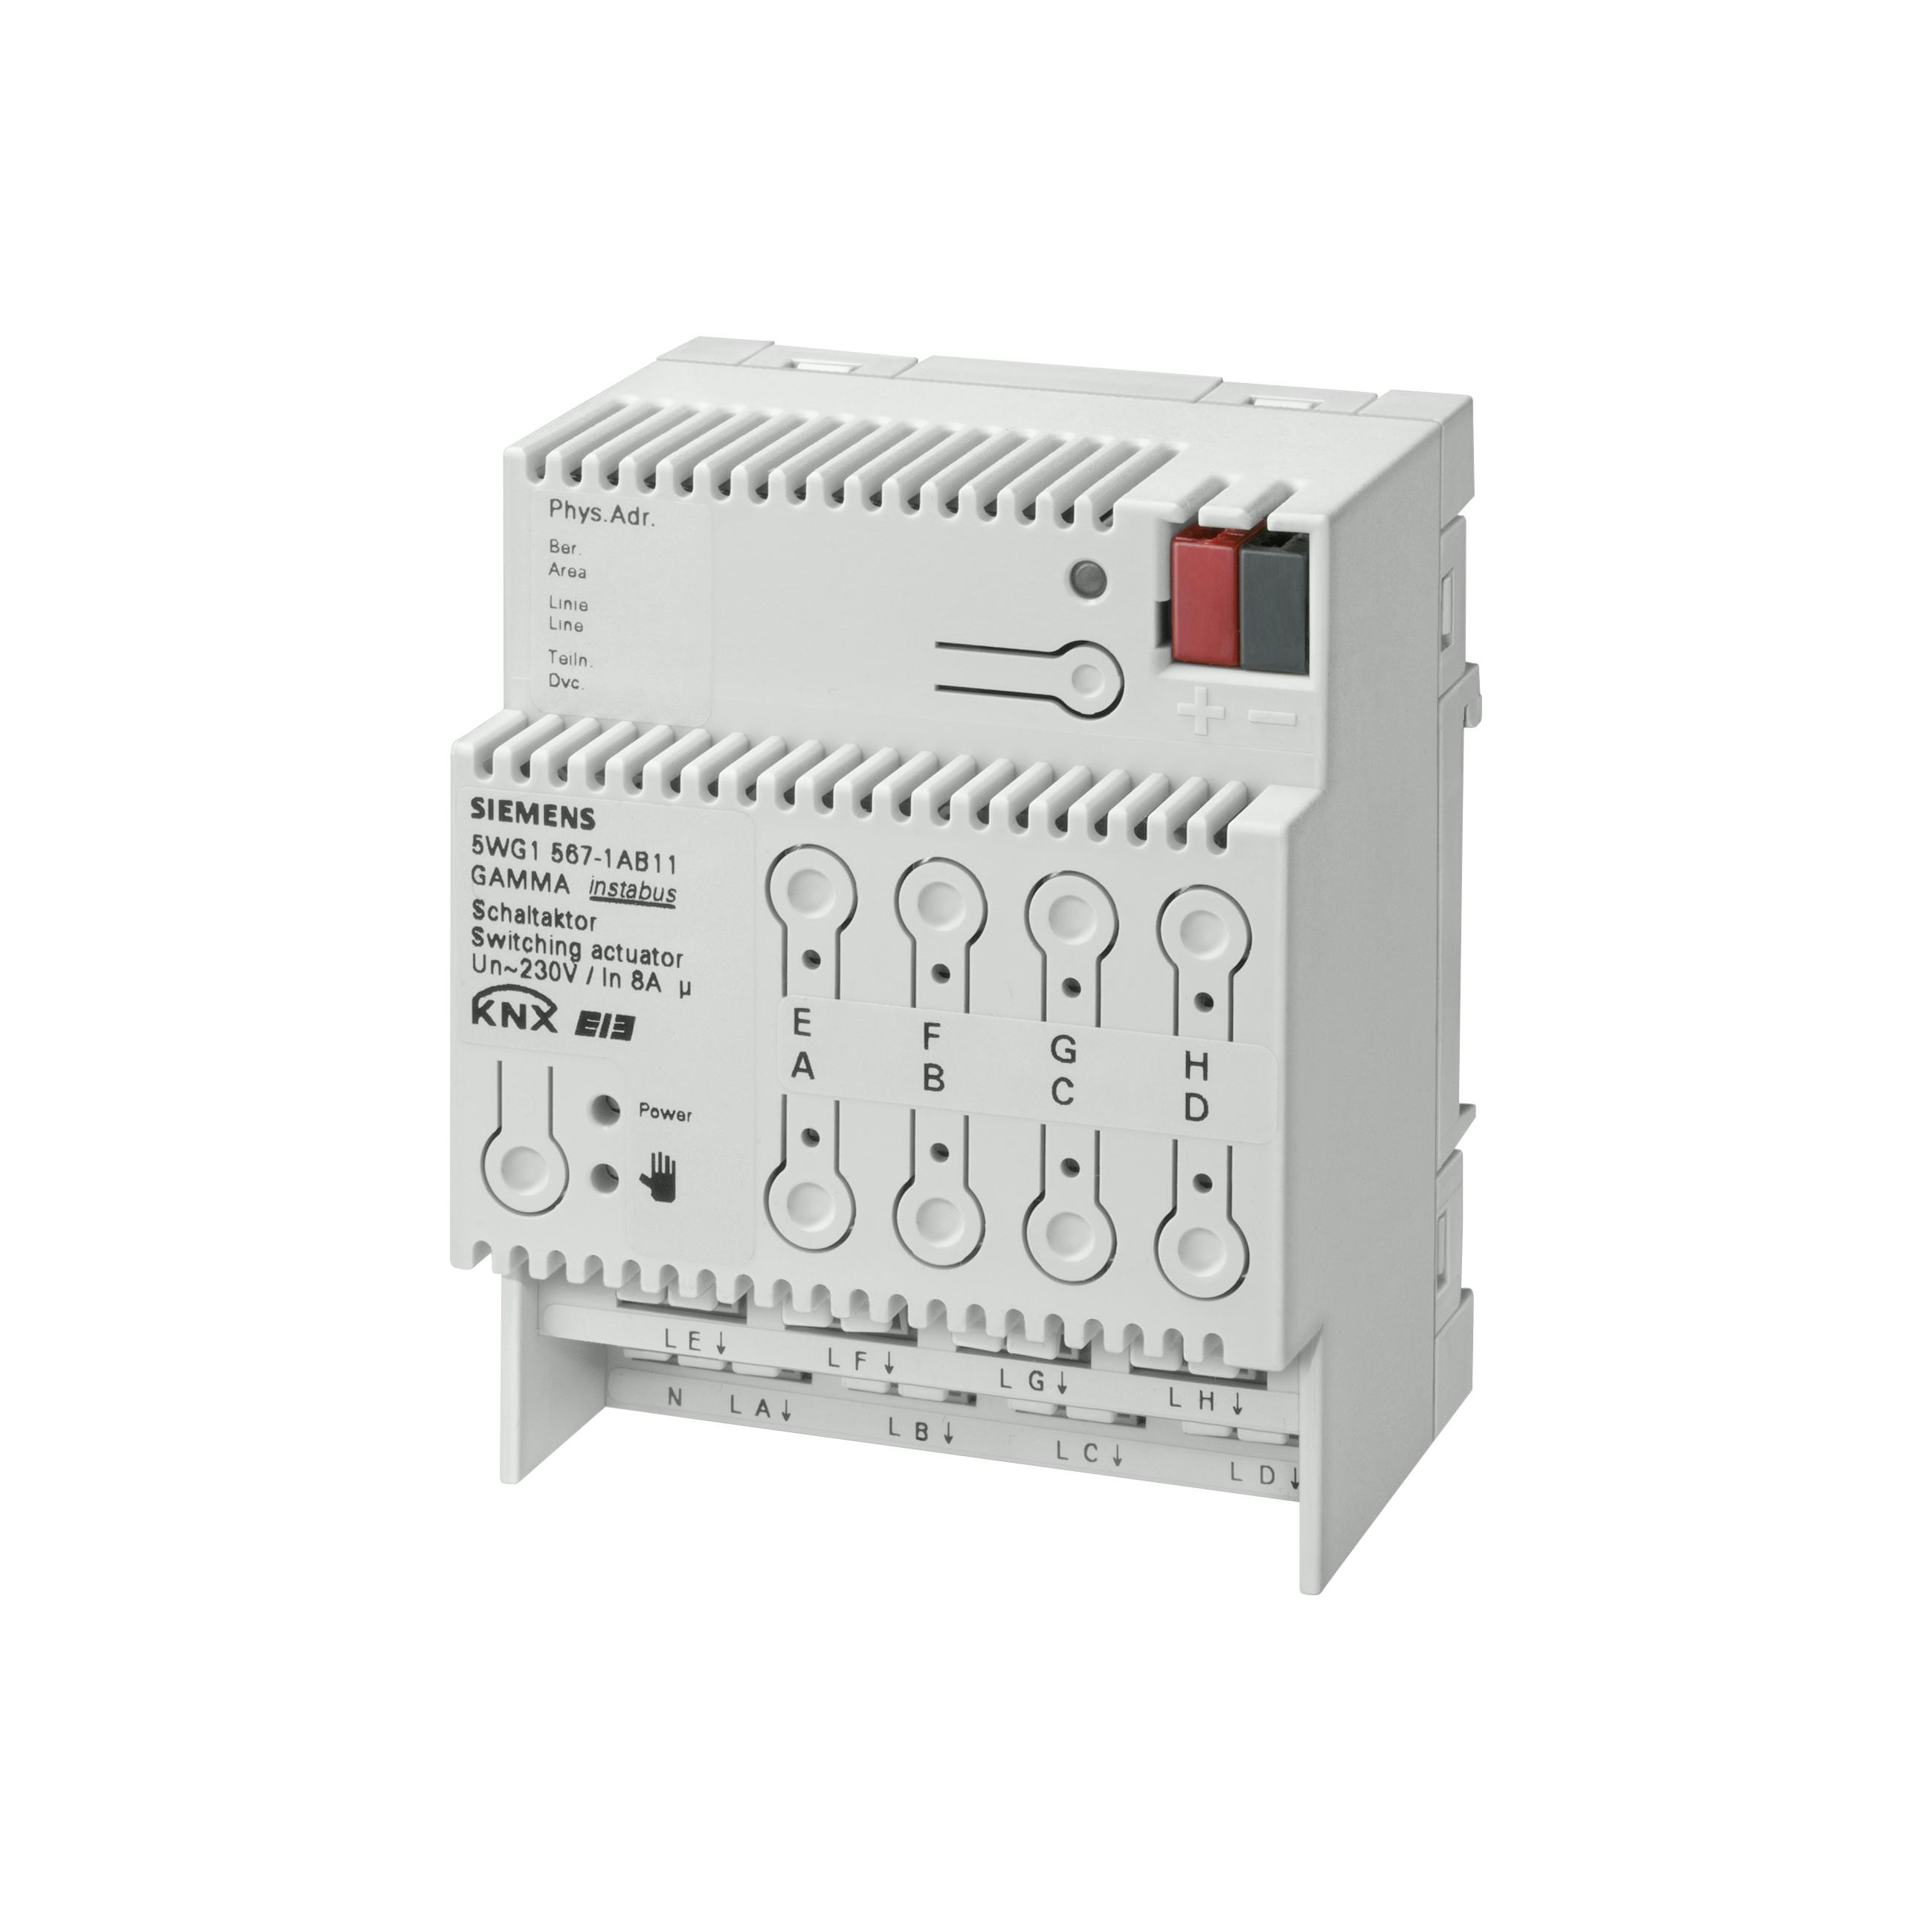 1 Stk Schaltaktor 8 x AC 230 V, 8 A KX5671AB11